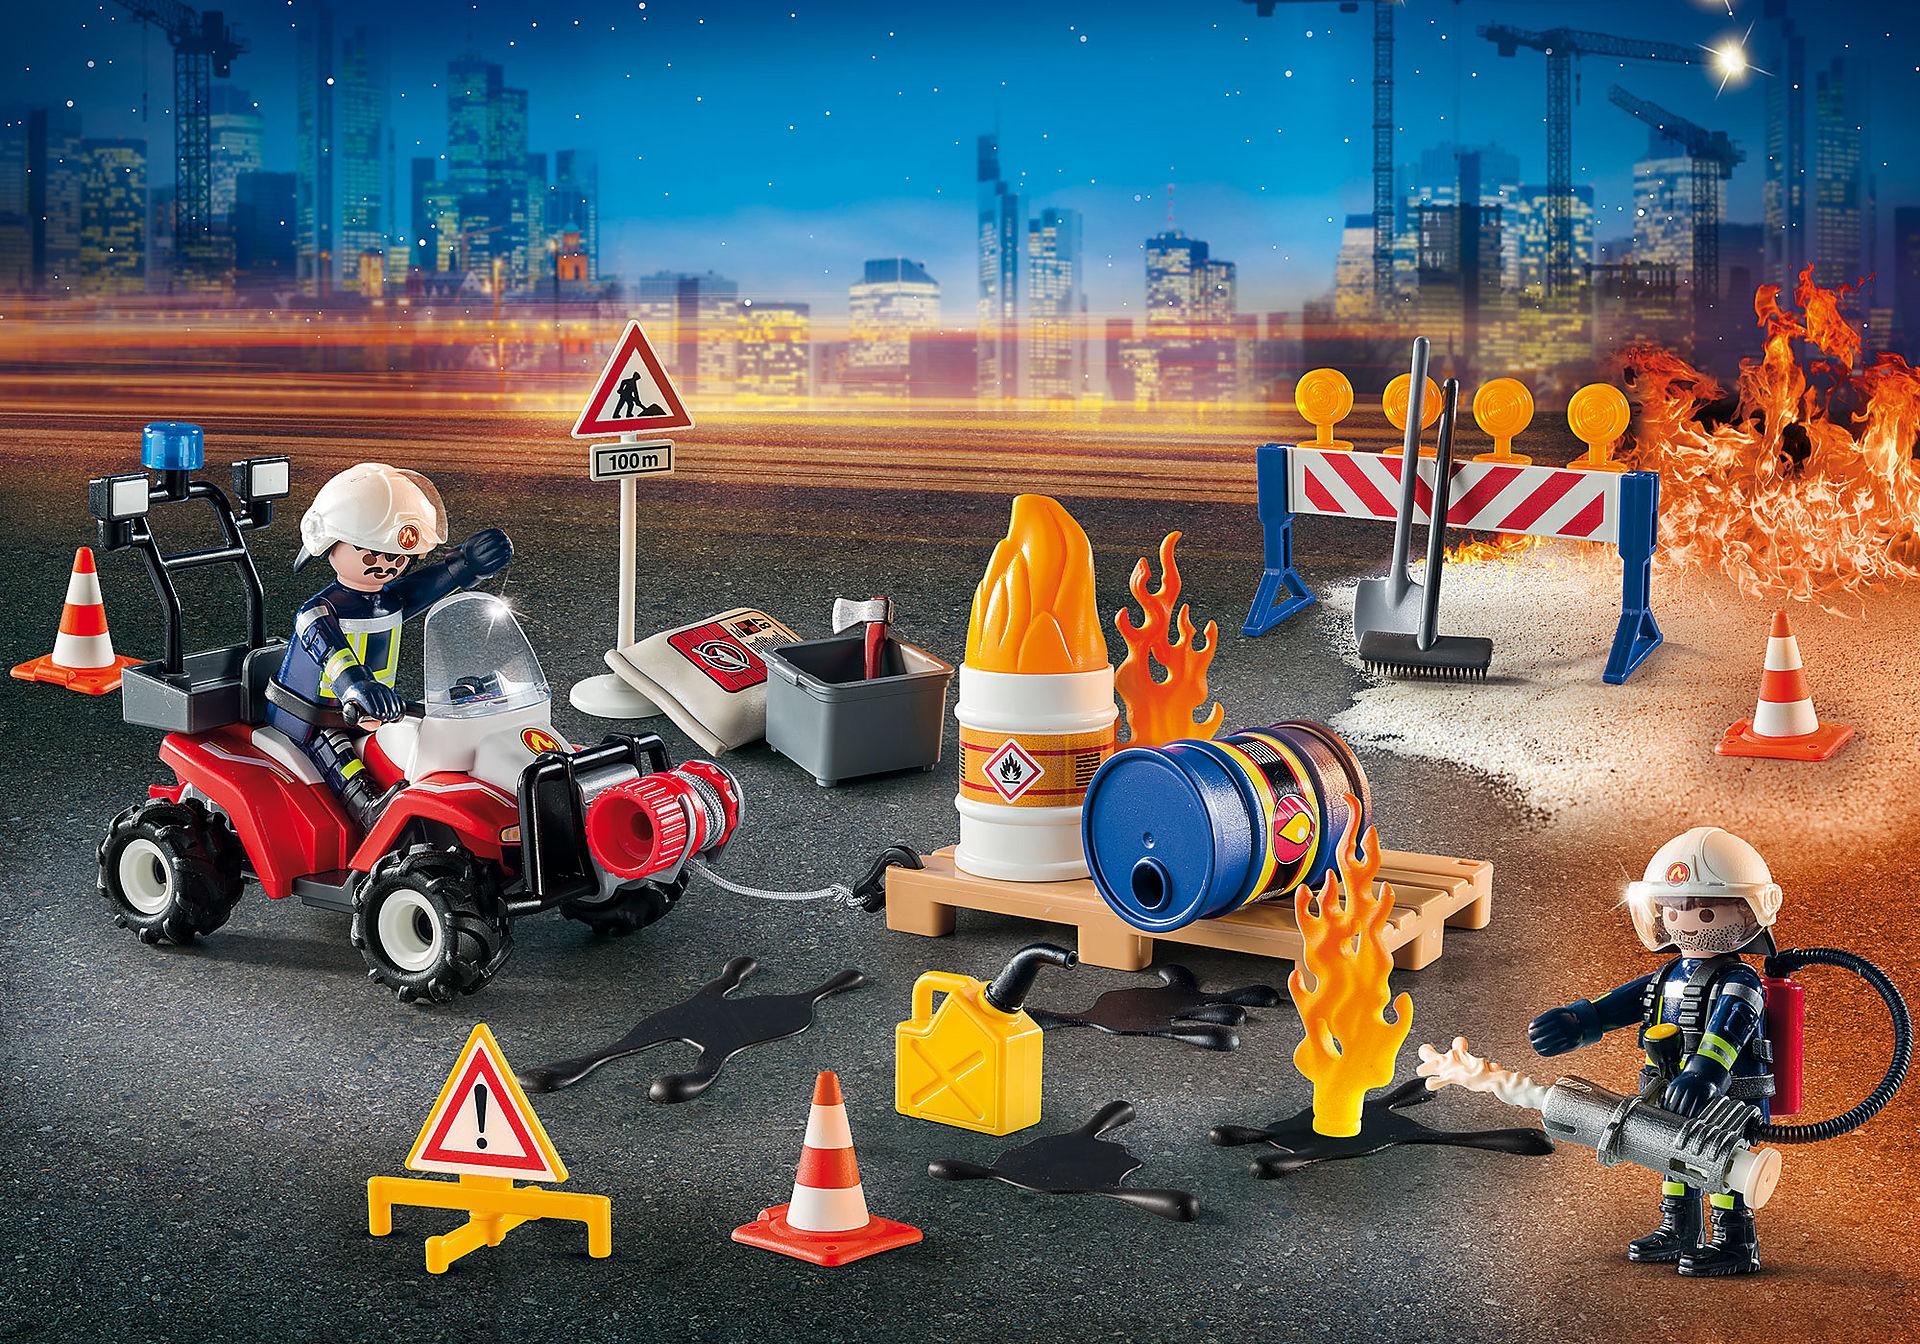 9486 Advent Calendar - Construction Site Fire Rescue zoom image3